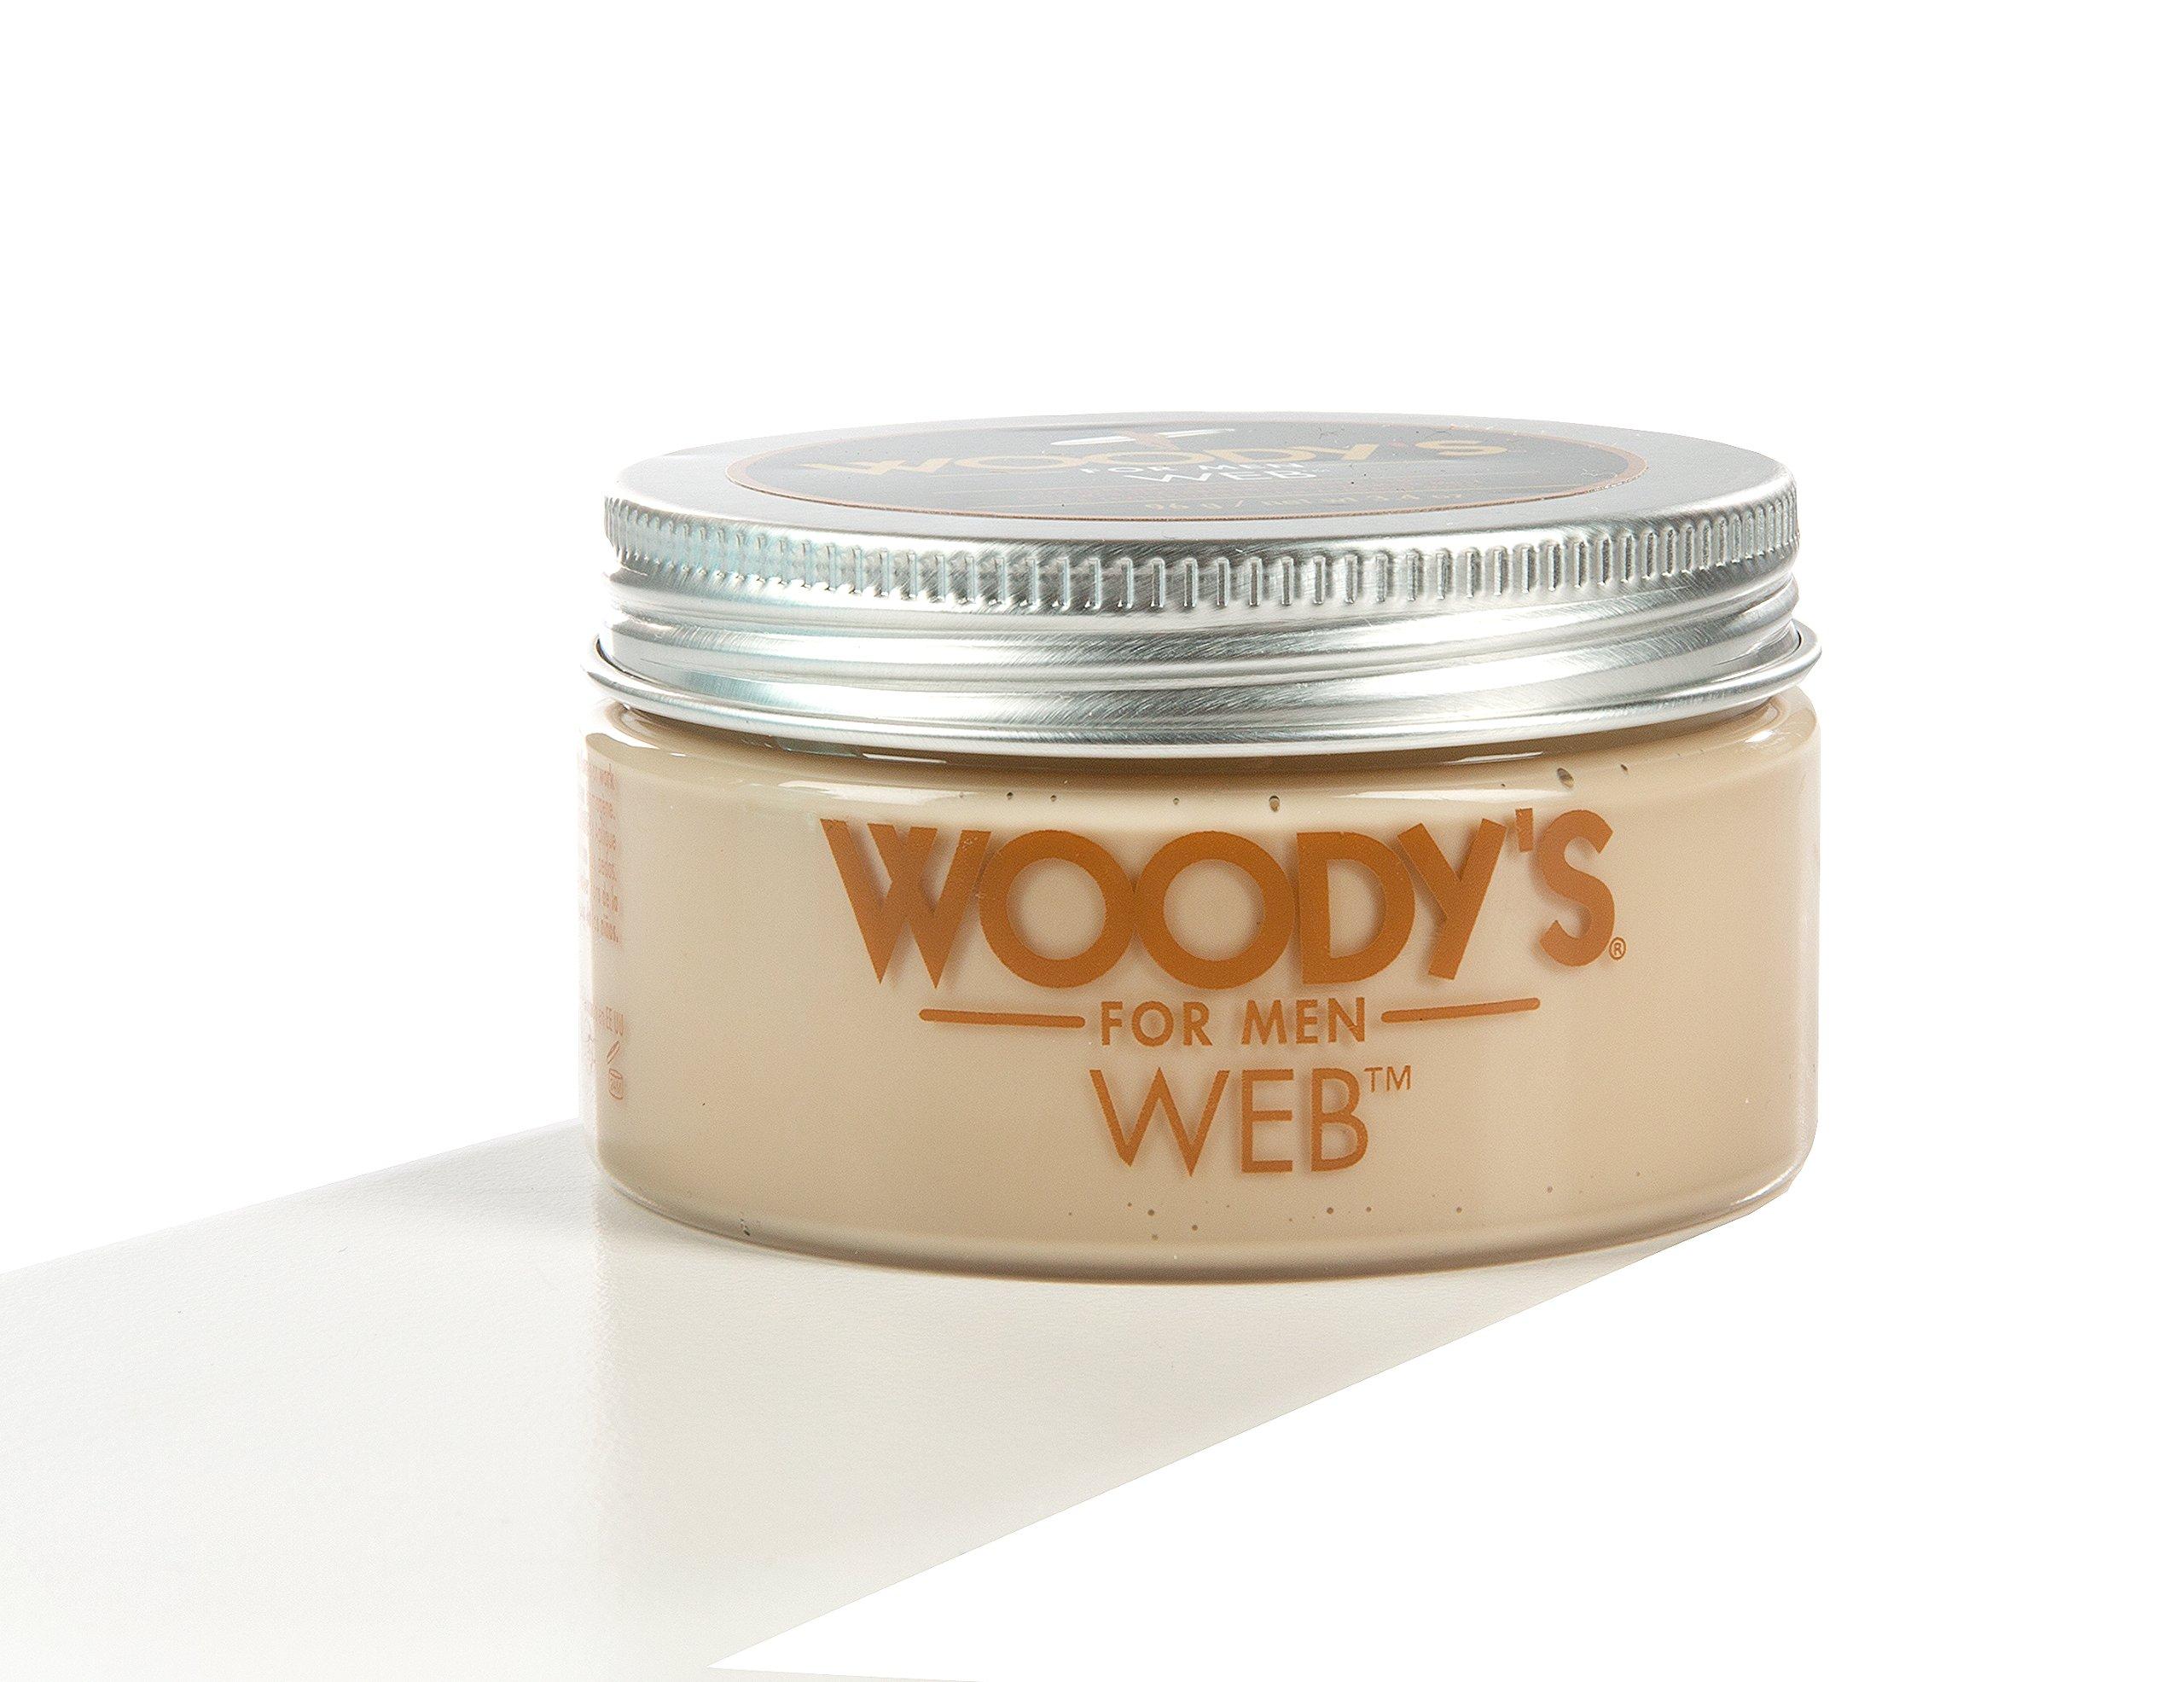 Woody's Quality Grooming Web 3.4 OZ